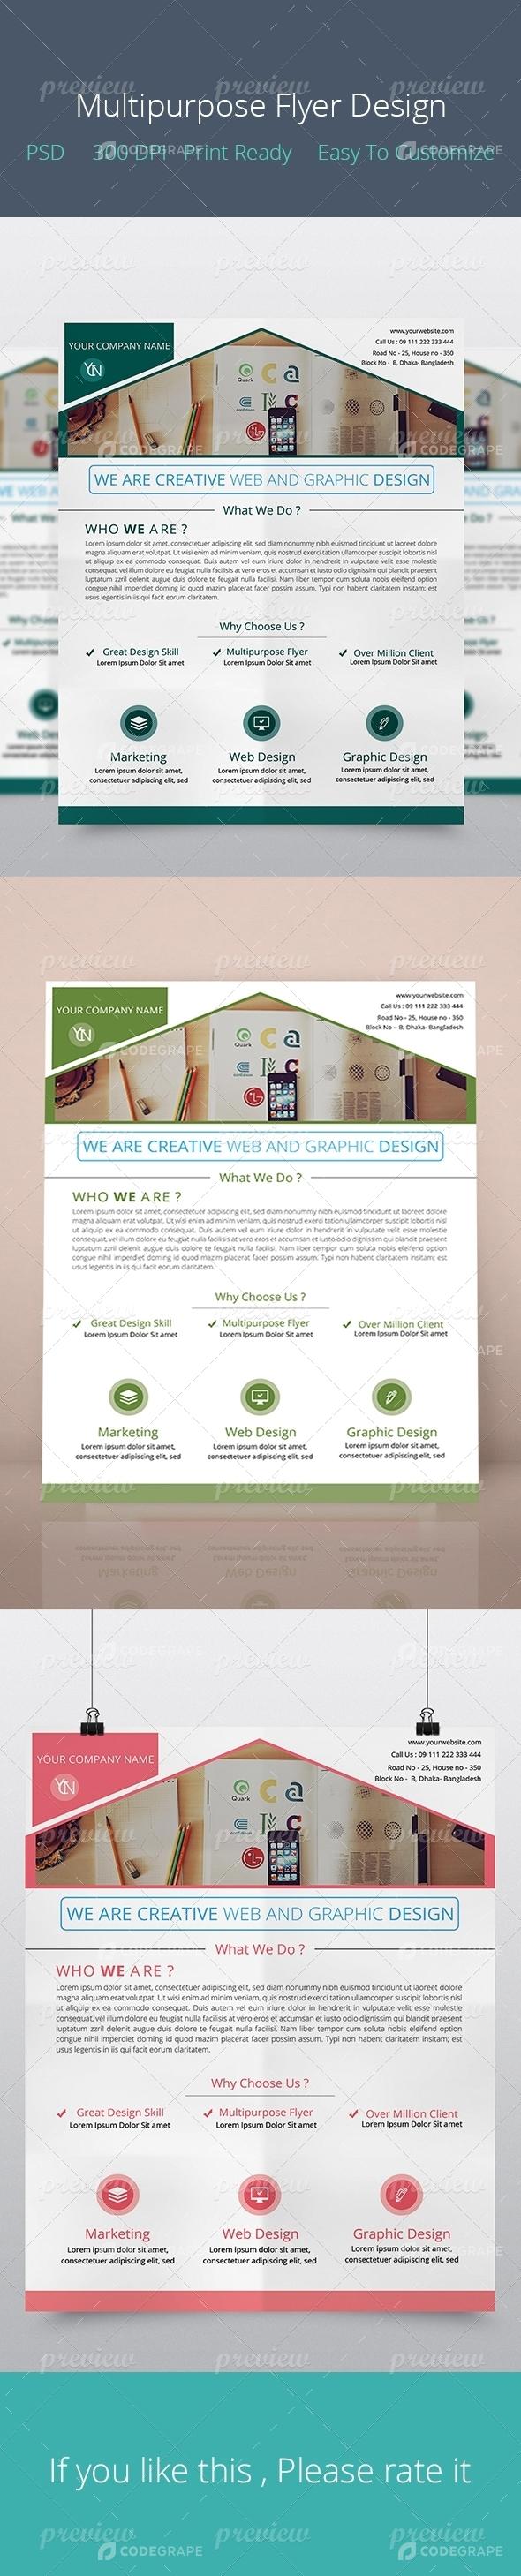 Multipurpose Flyer Design